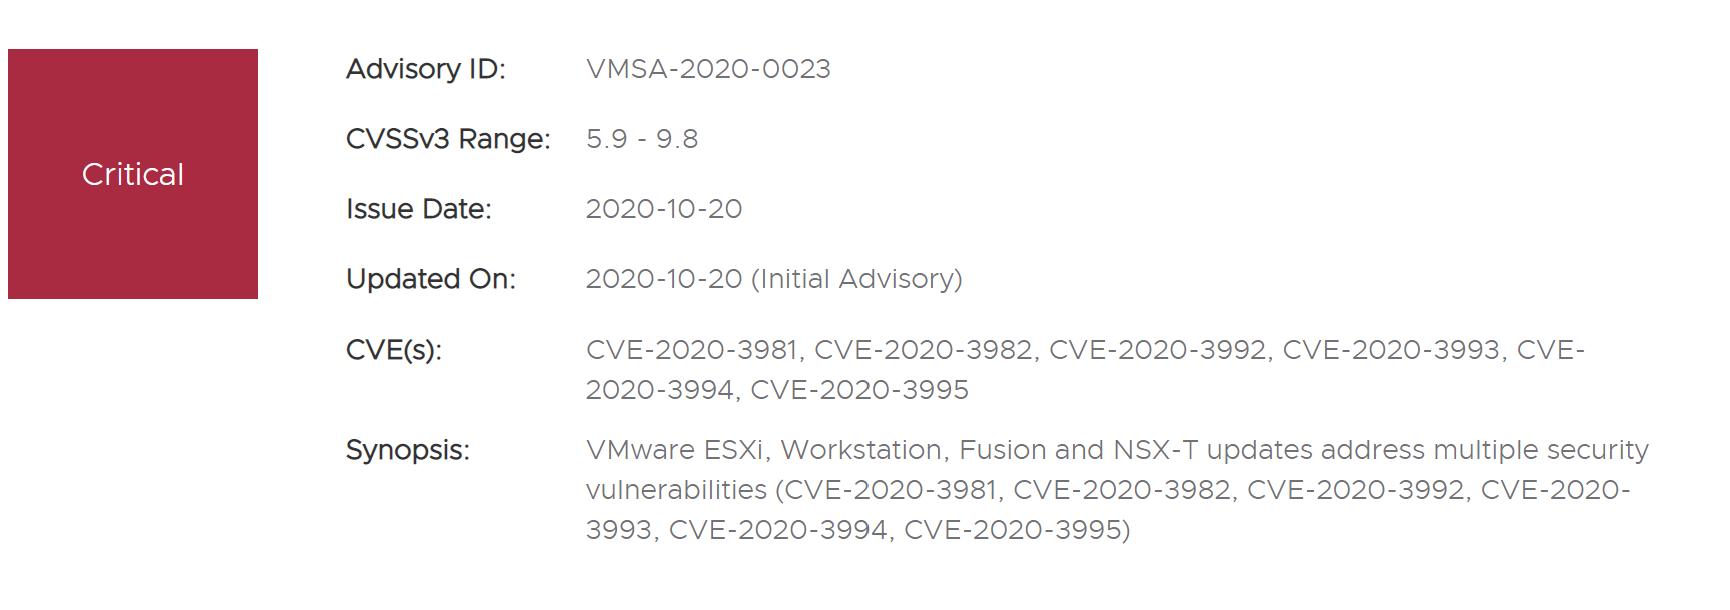 CVE-2020-3992: VMWARE ESXI Remote Code Execution Vulnerability Alert